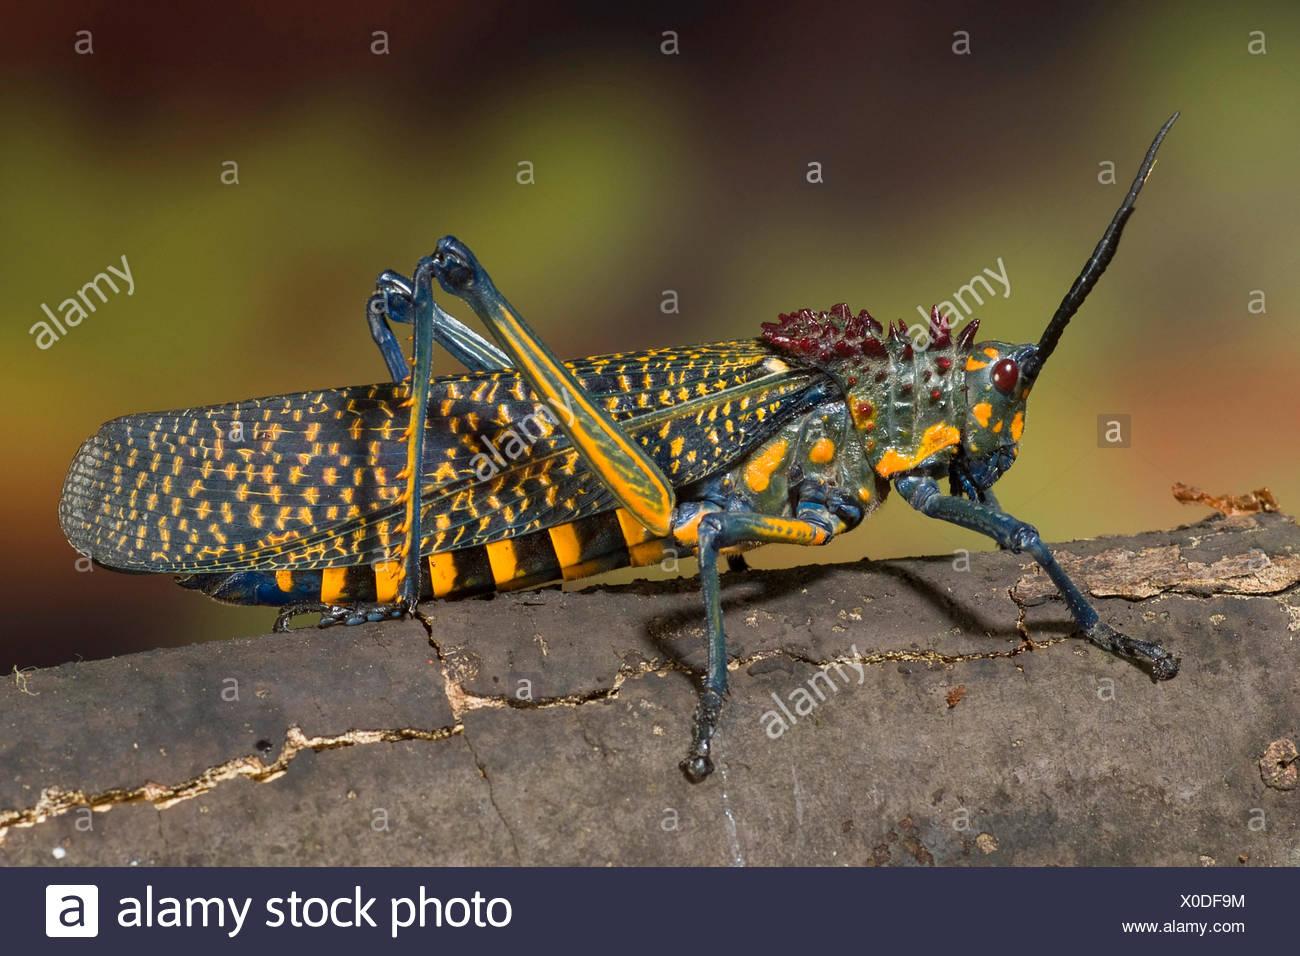 Grasshopper (Phymateus saxosus), on a branch - Stock Image